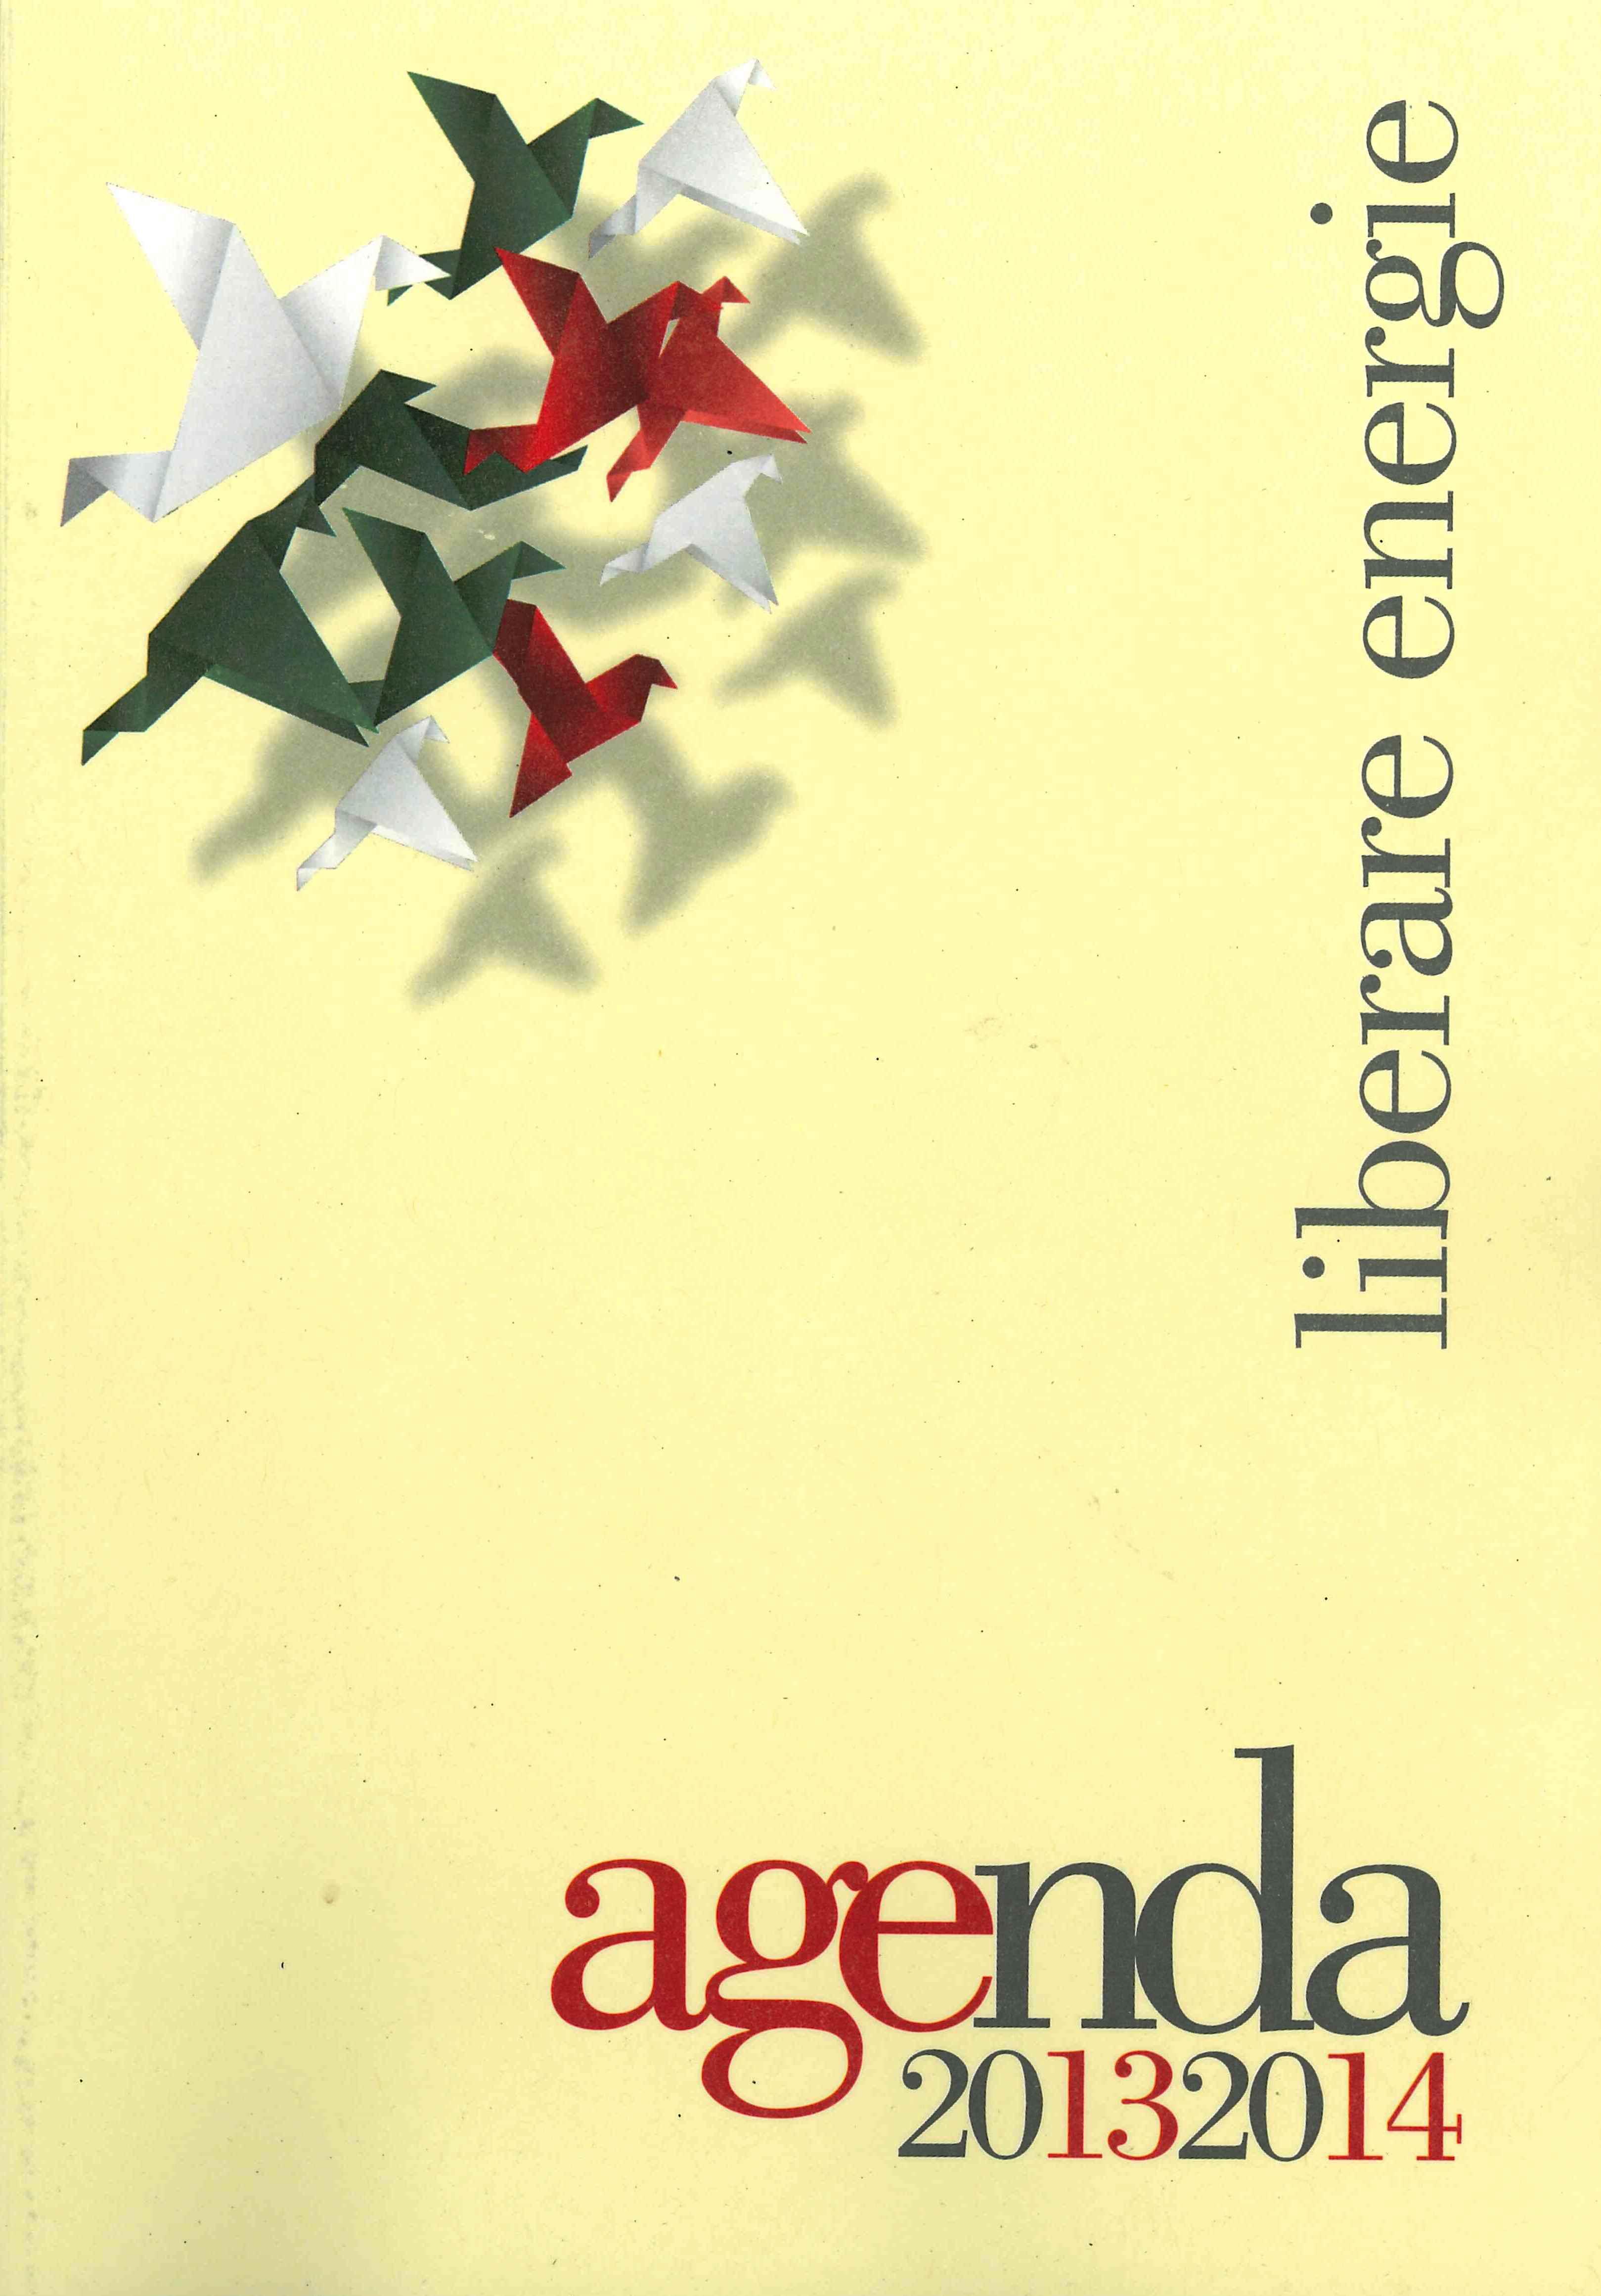 AGENDA 2013-2014, DIALOGO FRA CARTA E WEB